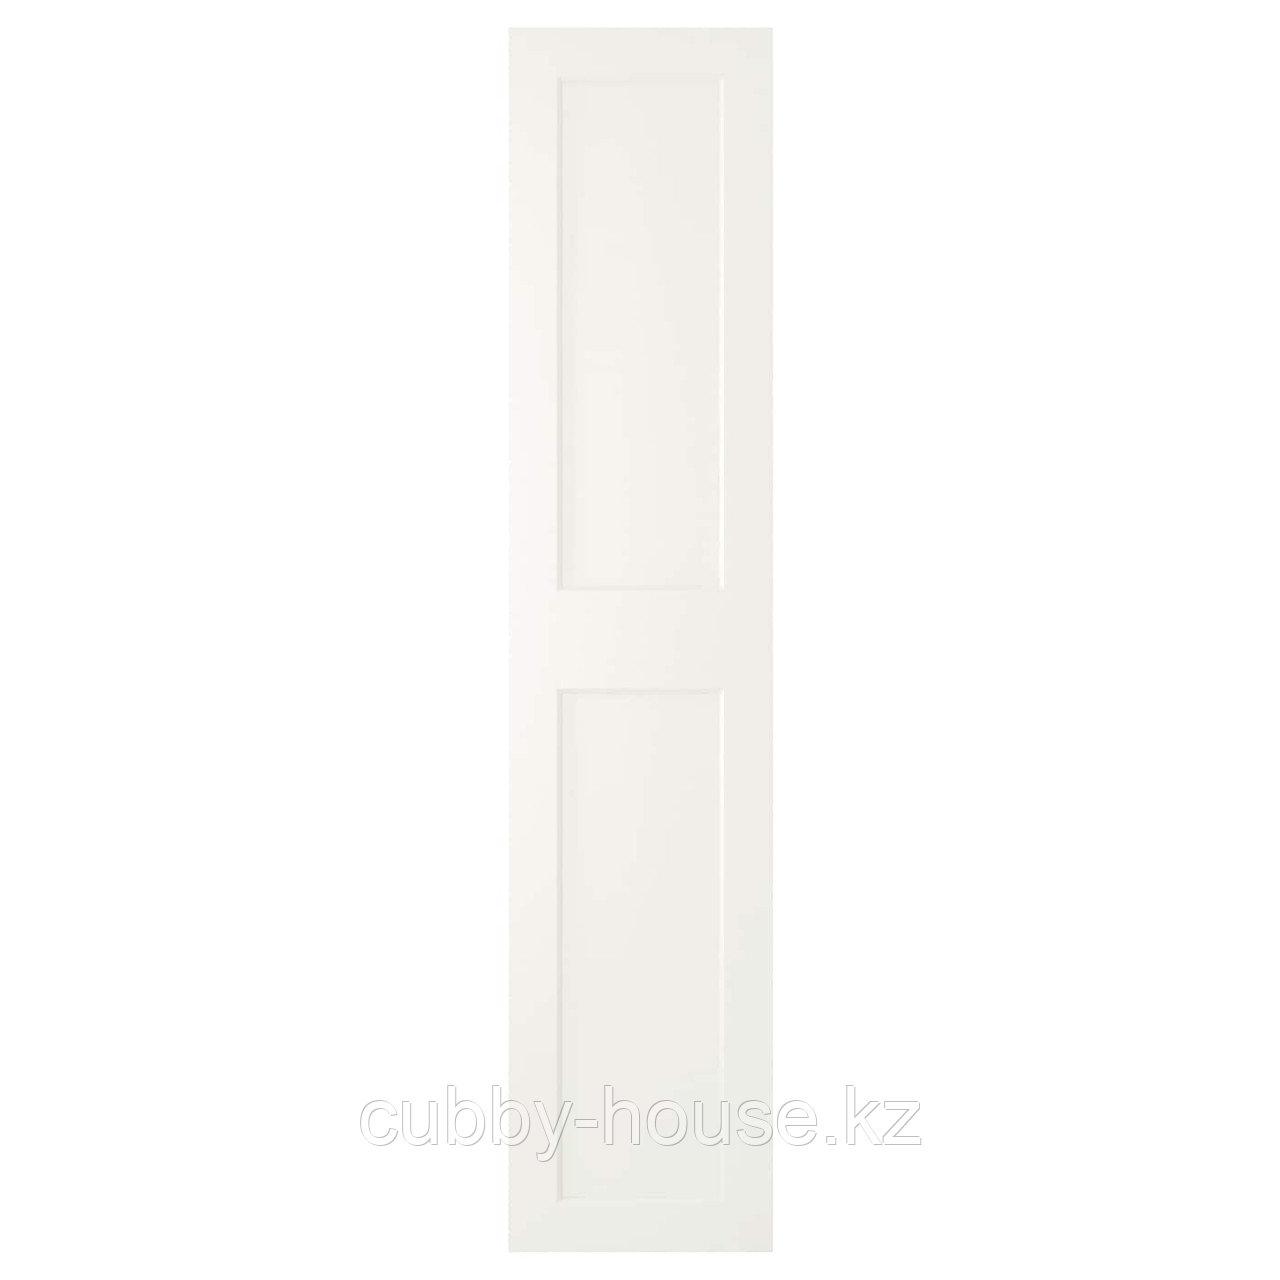 ГРИМО Дверца с петлями, белый, 50x229 см